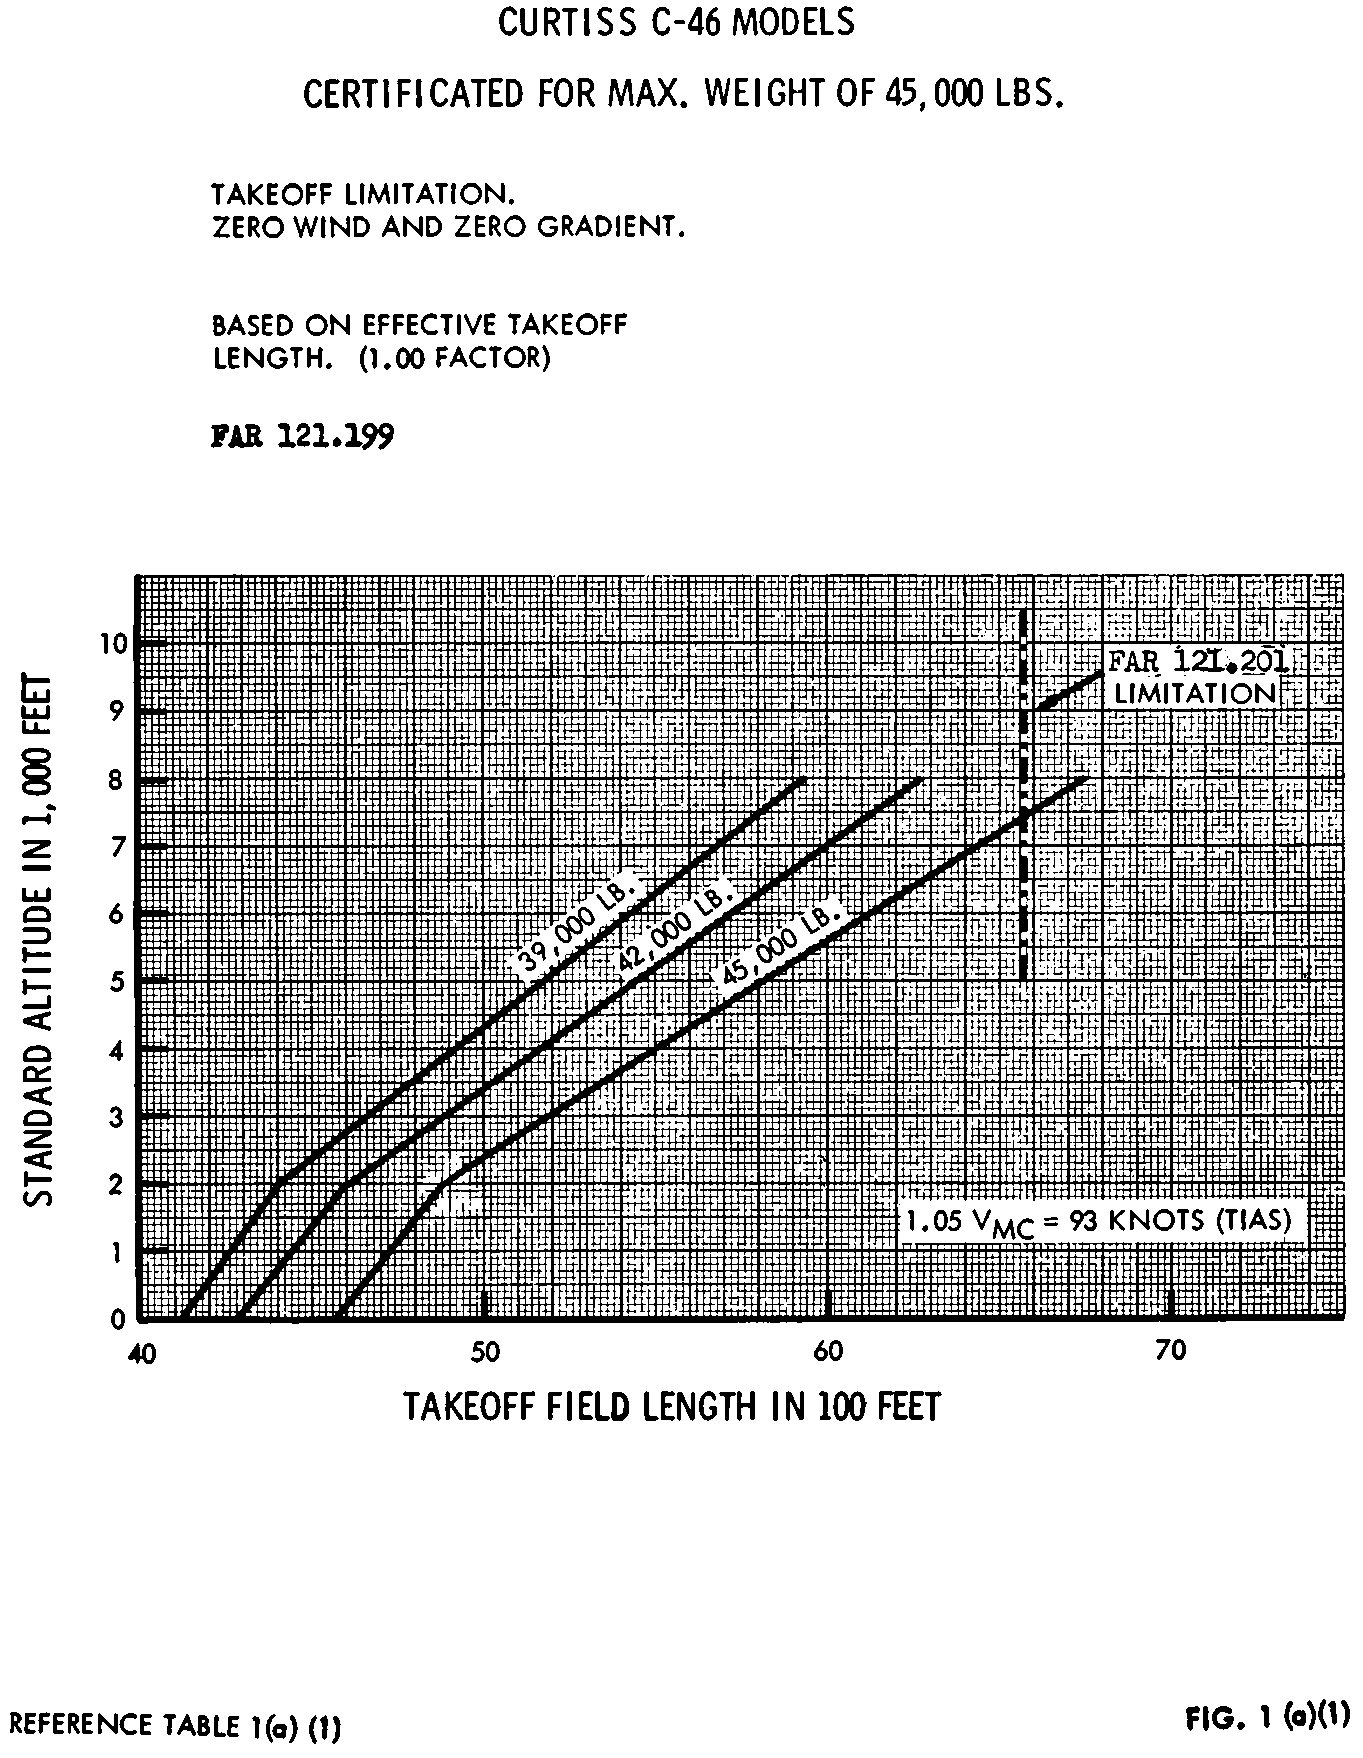 Graphic of Ref. Fig. 3(c)(2).